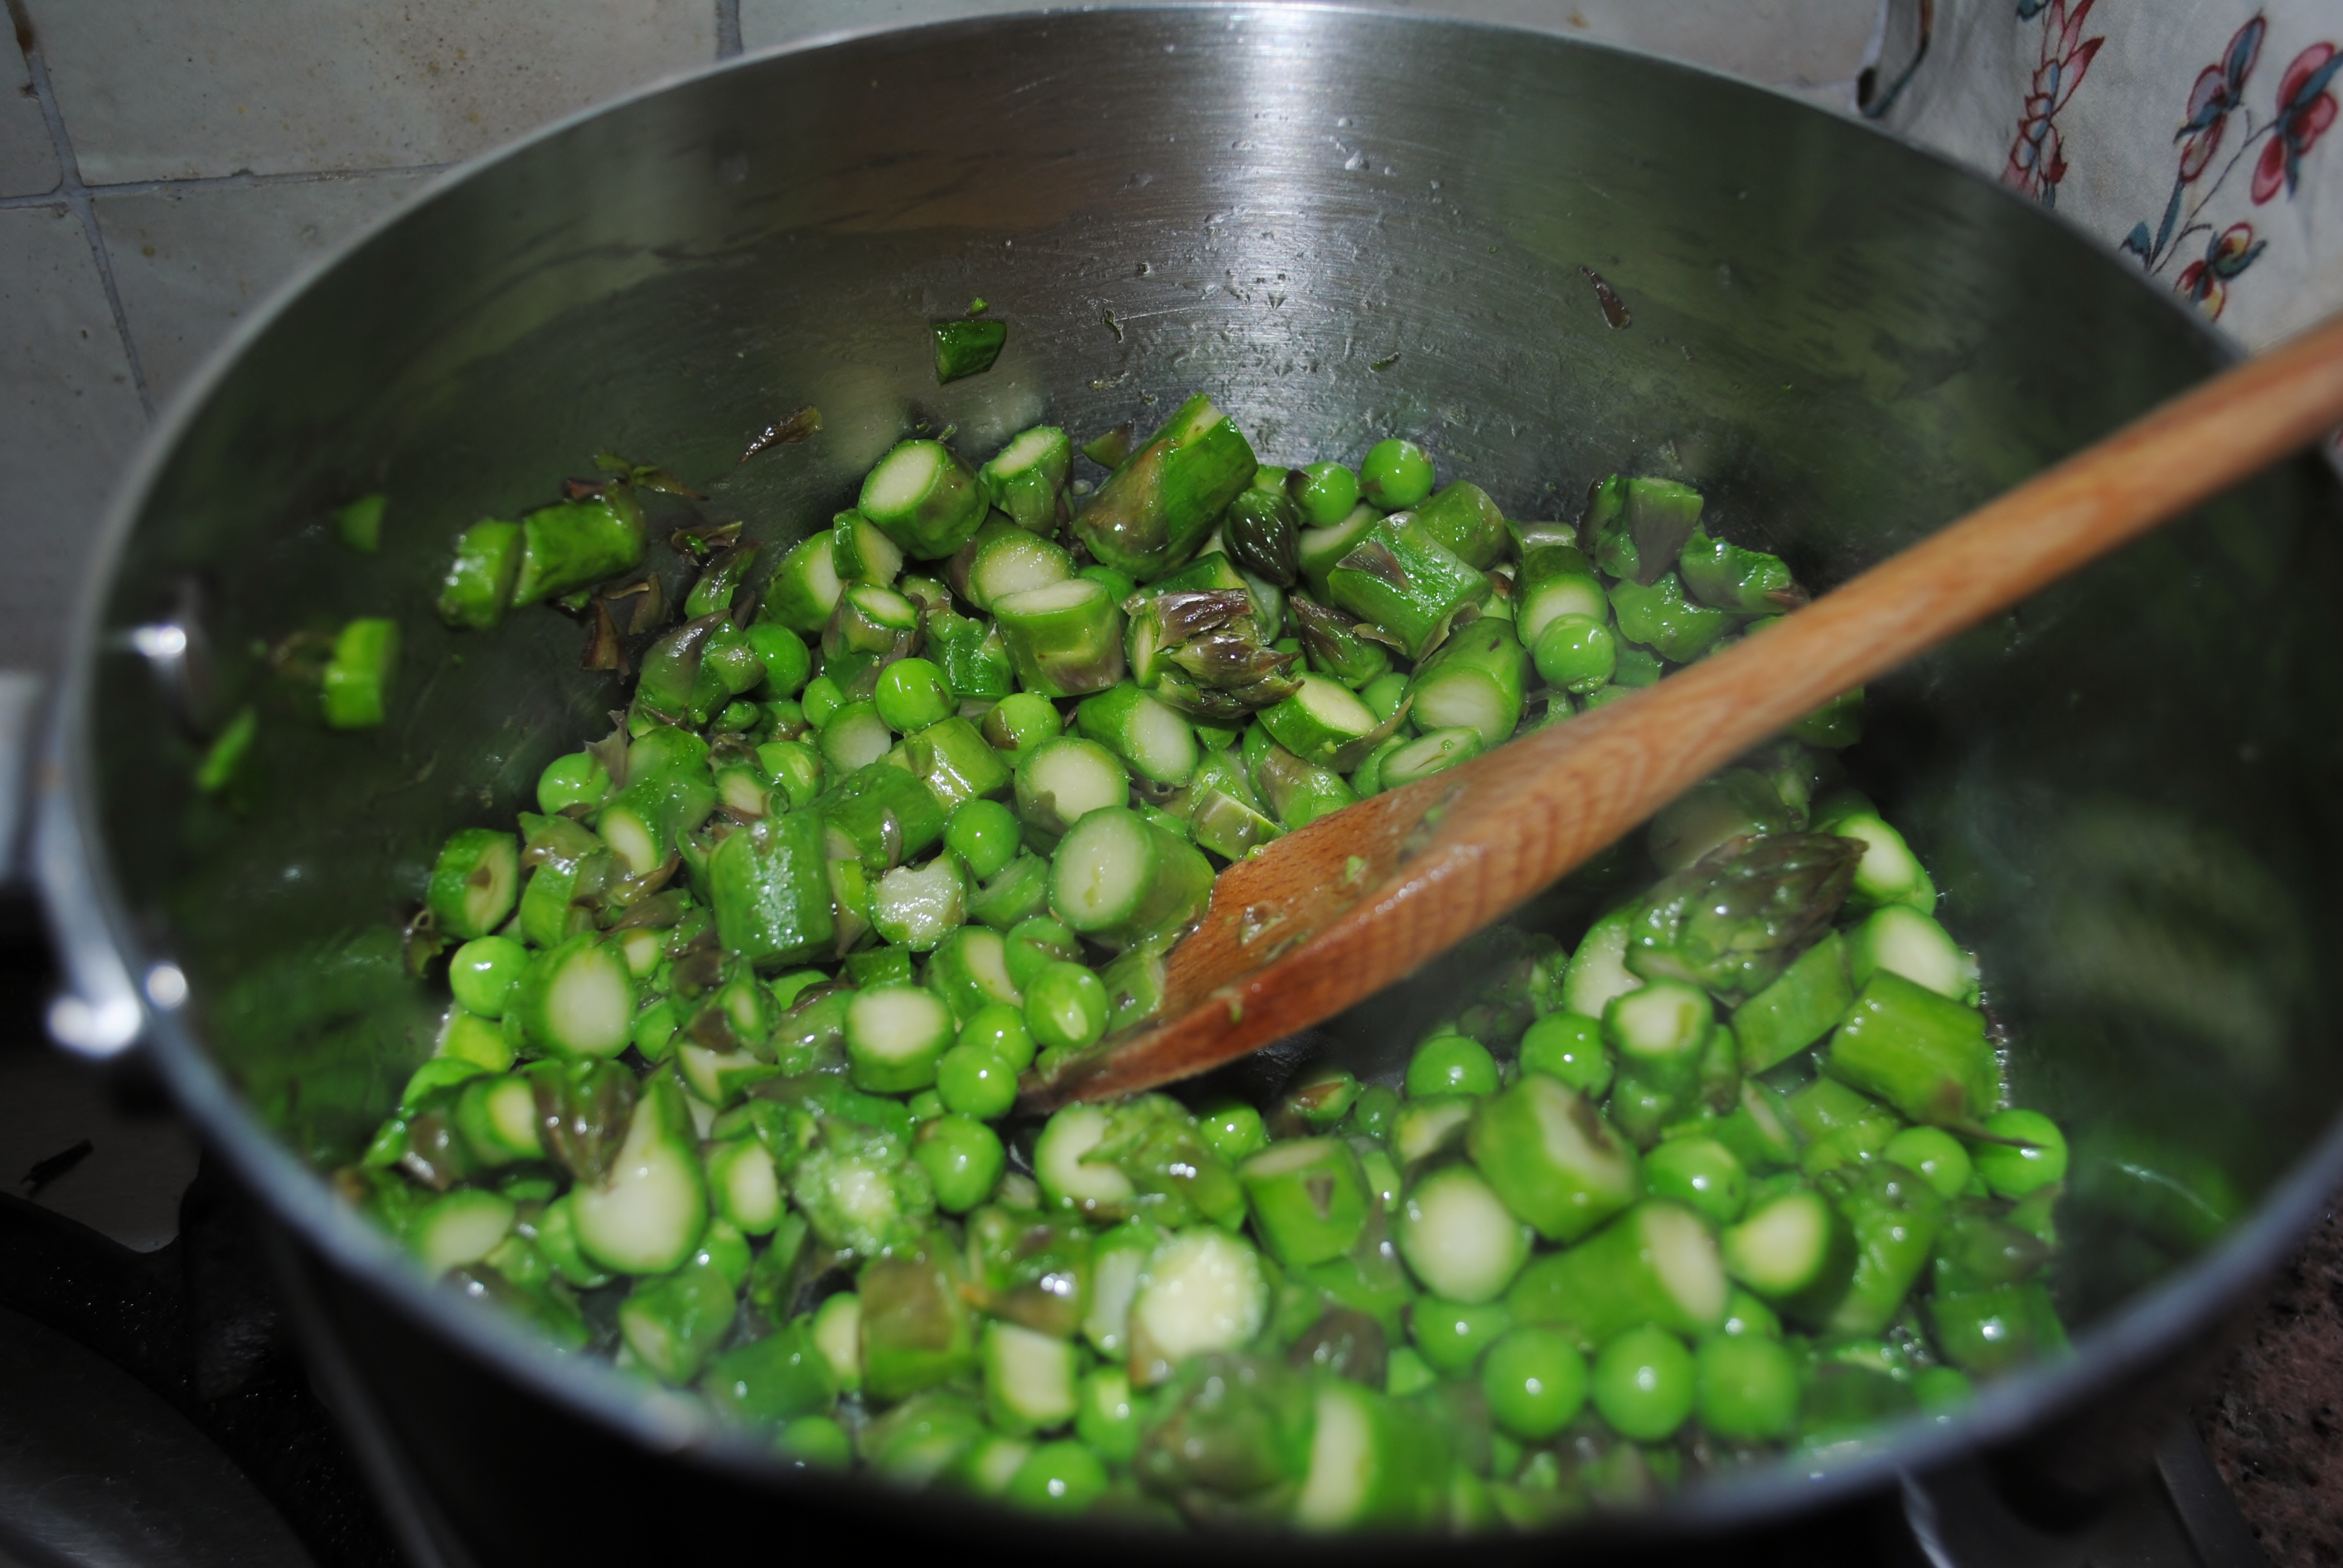 Making asparagus mousse